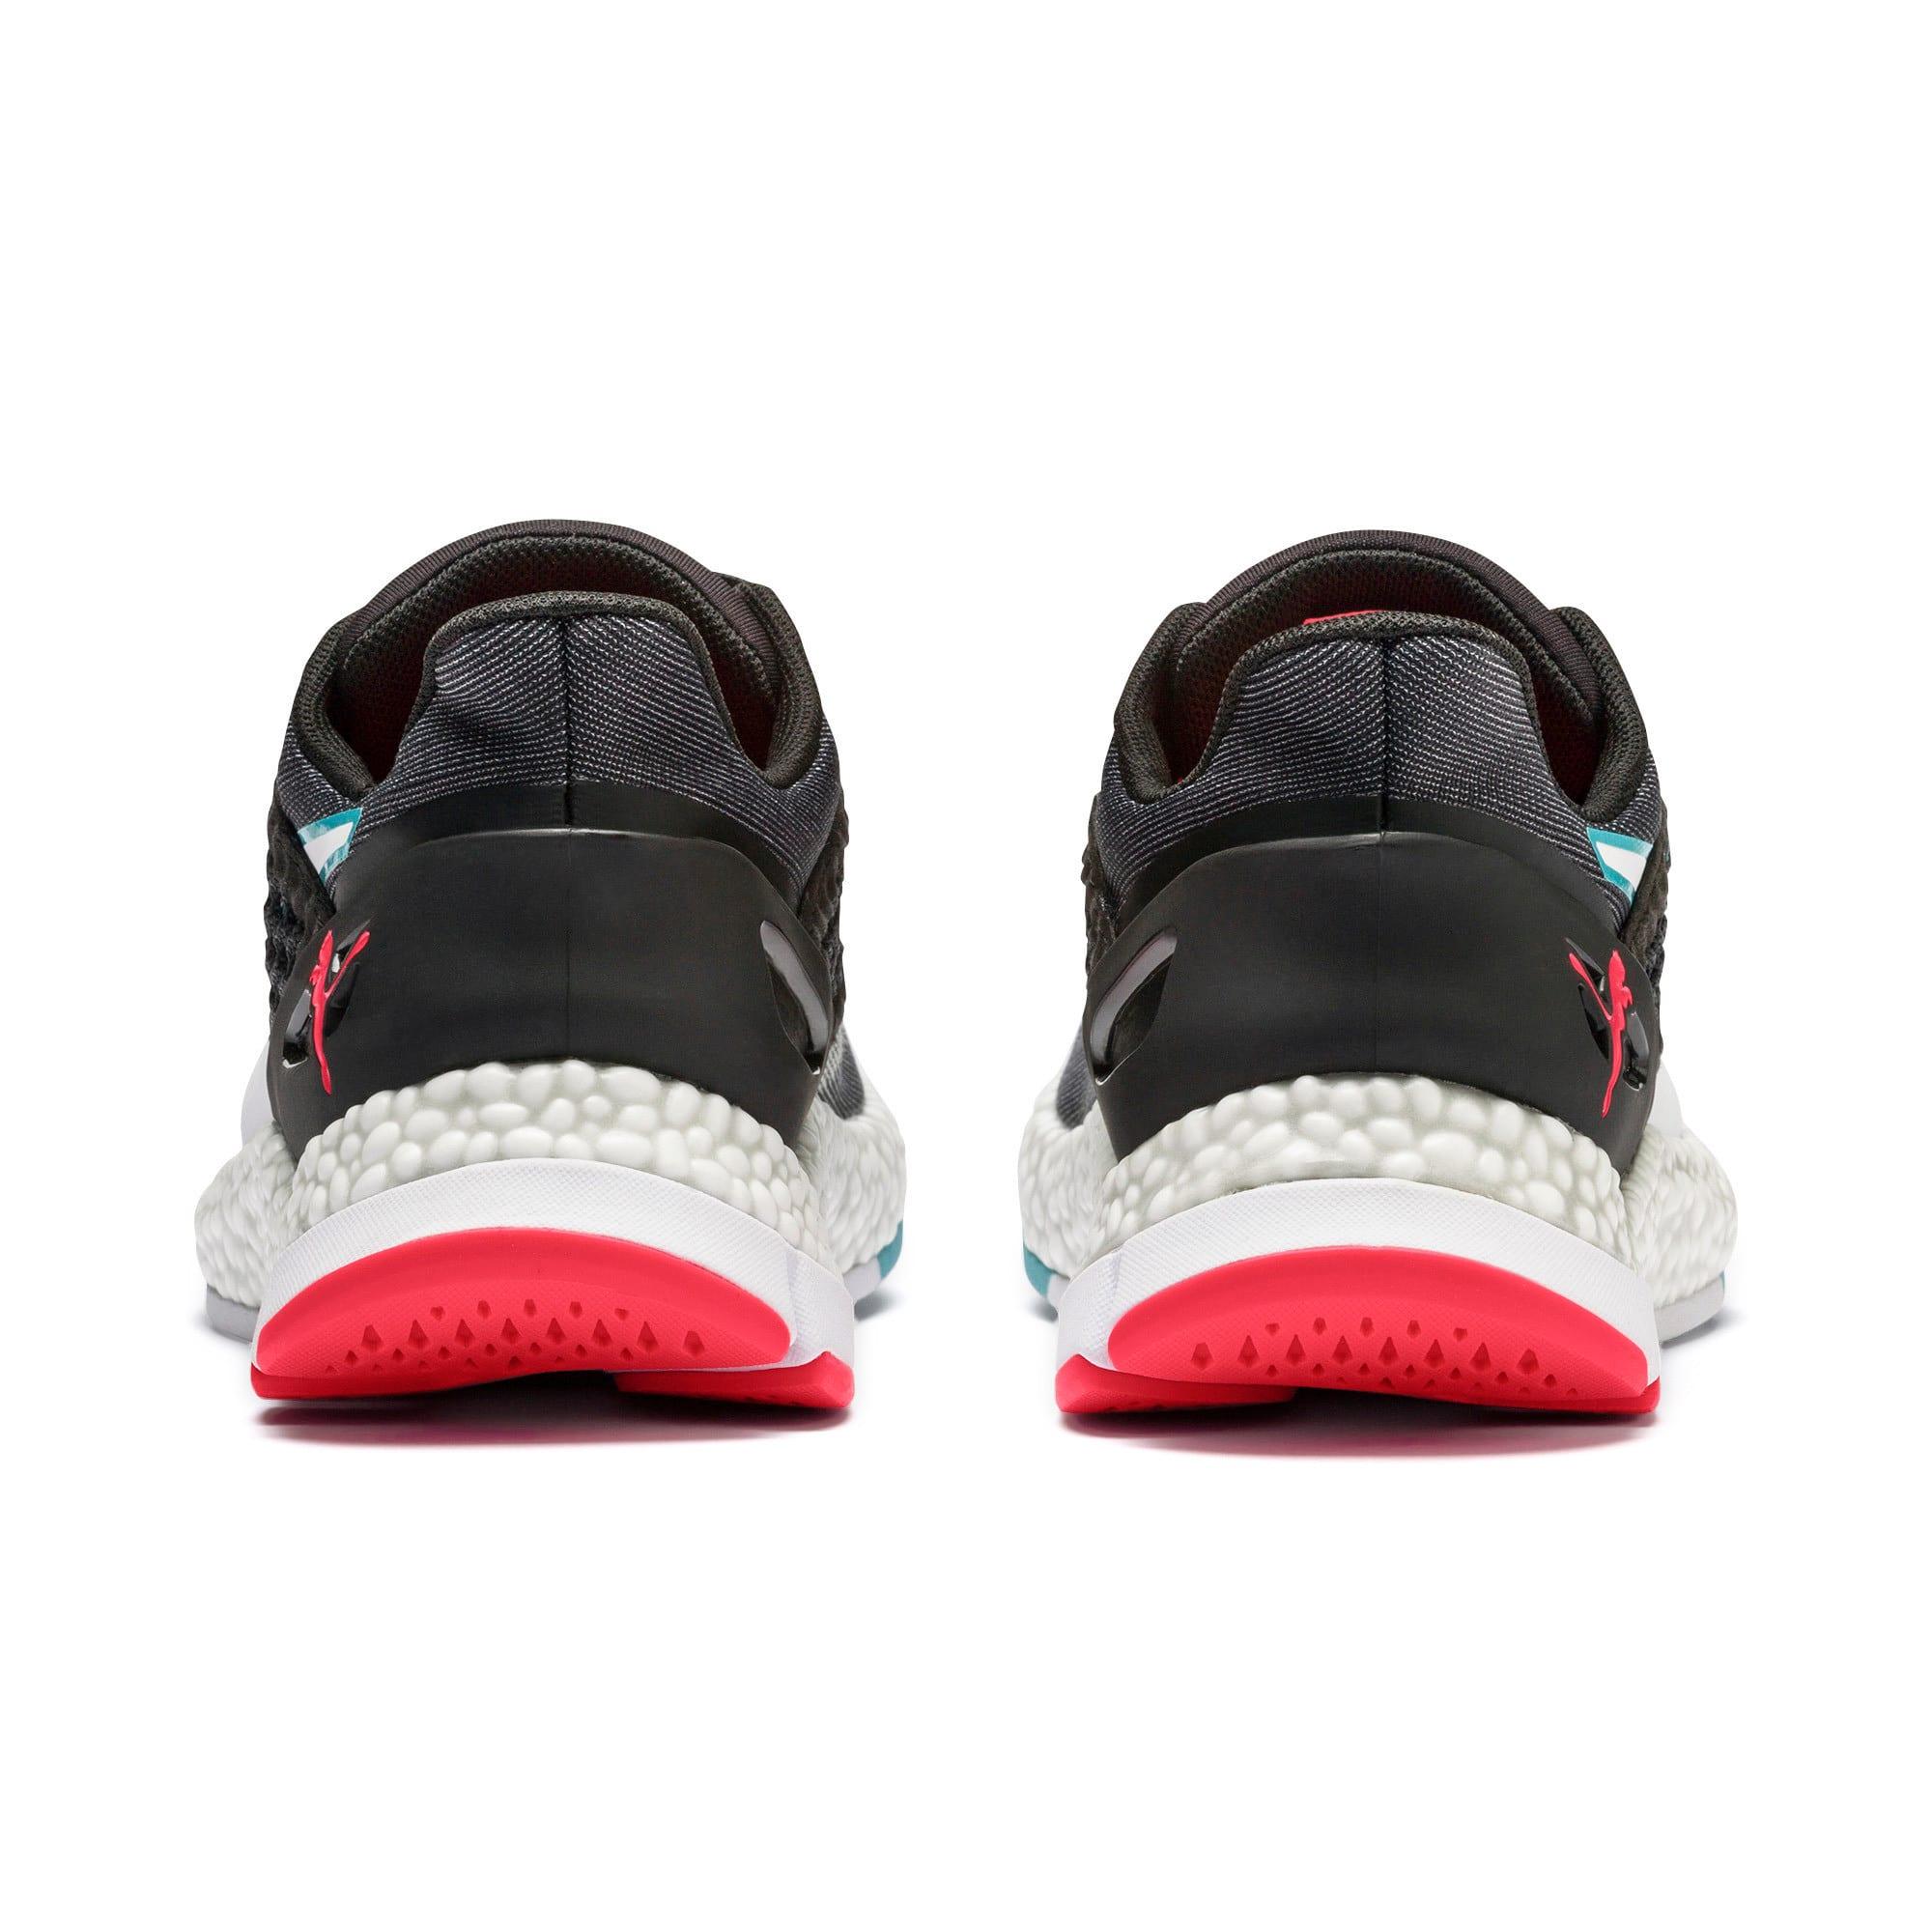 Thumbnail 5 of HYBRID NETFIT Astro Women's Running Shoes, Puma Black-Pink Alert, medium-IND